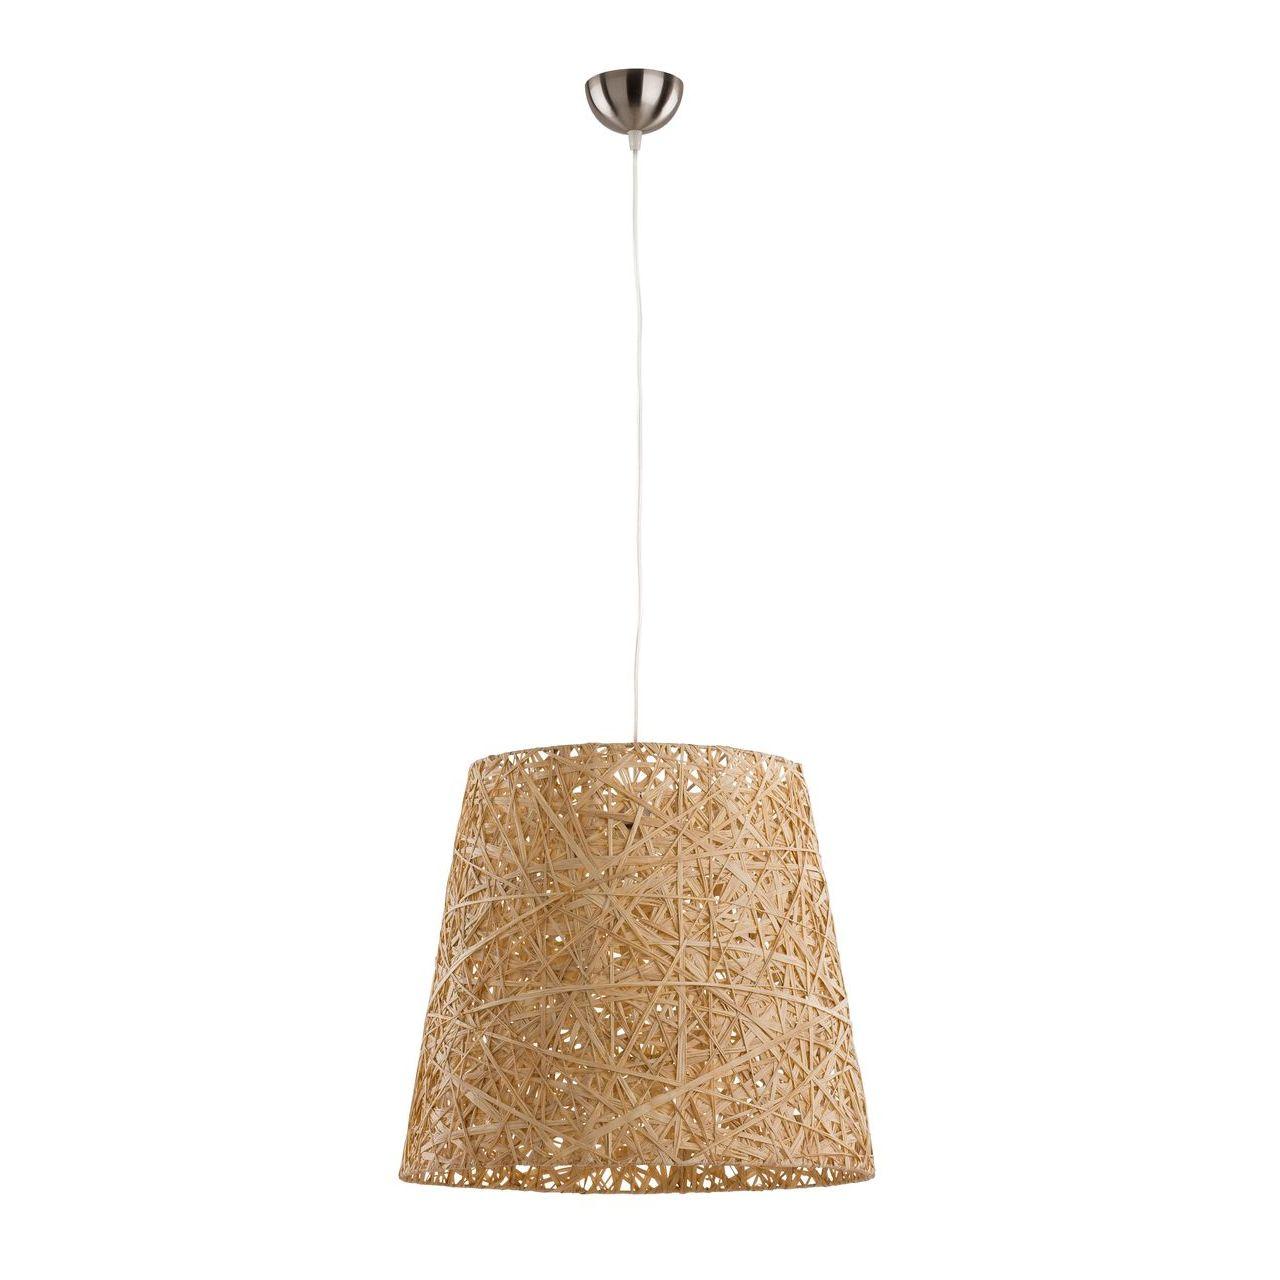 все цены на Подвесной светильник Alfa, E14, 40 Вт онлайн